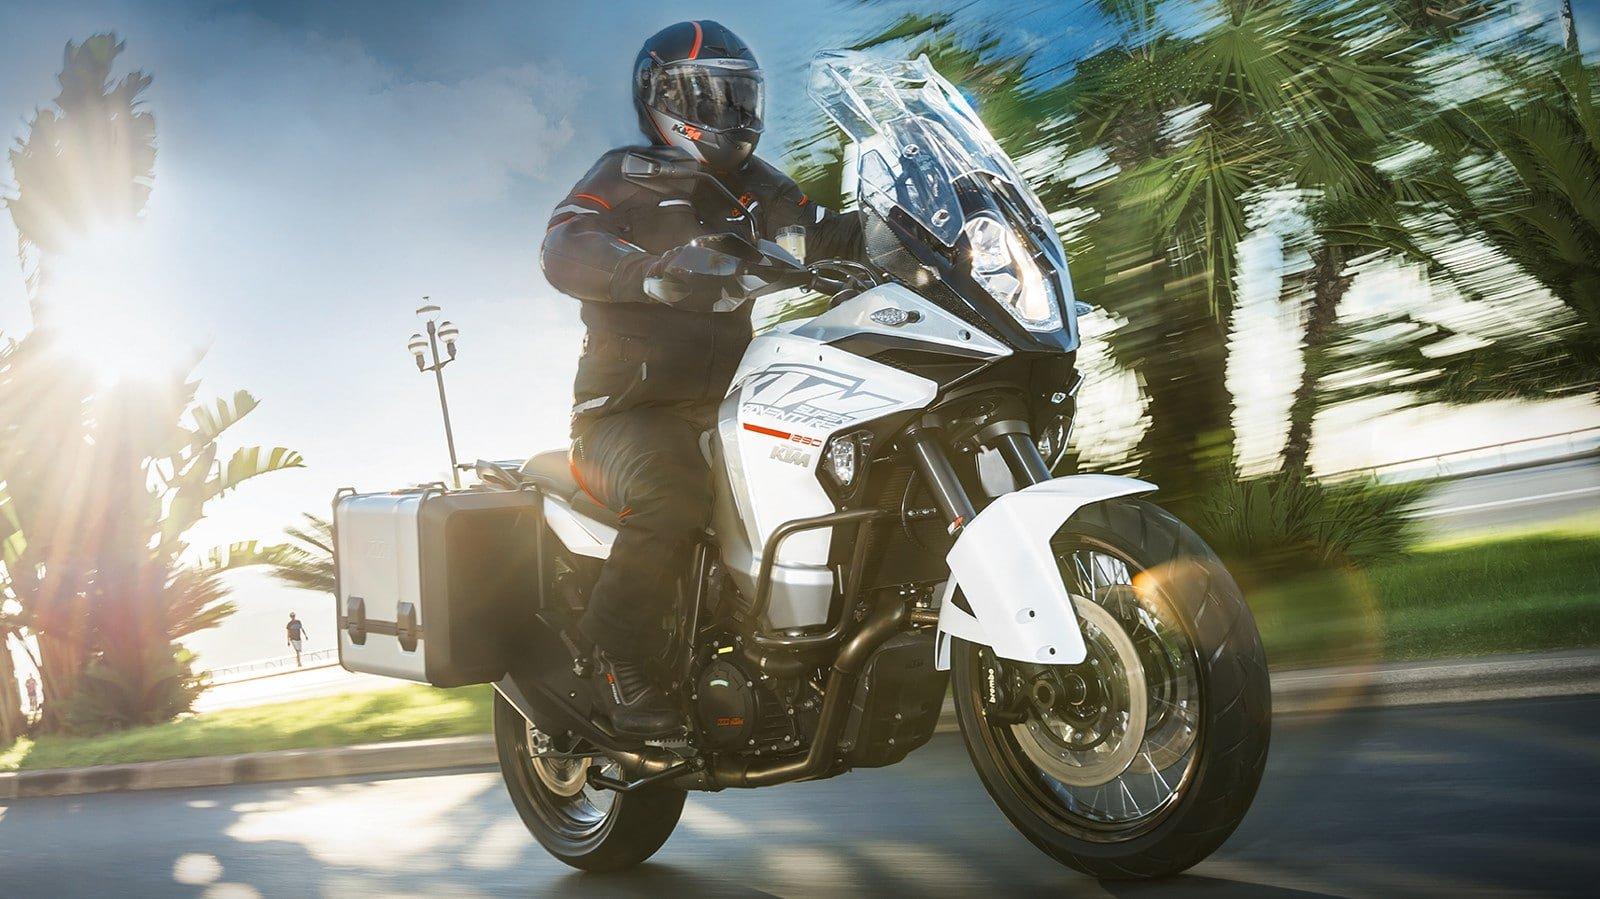 2016 KTM 1290 Super Adventure